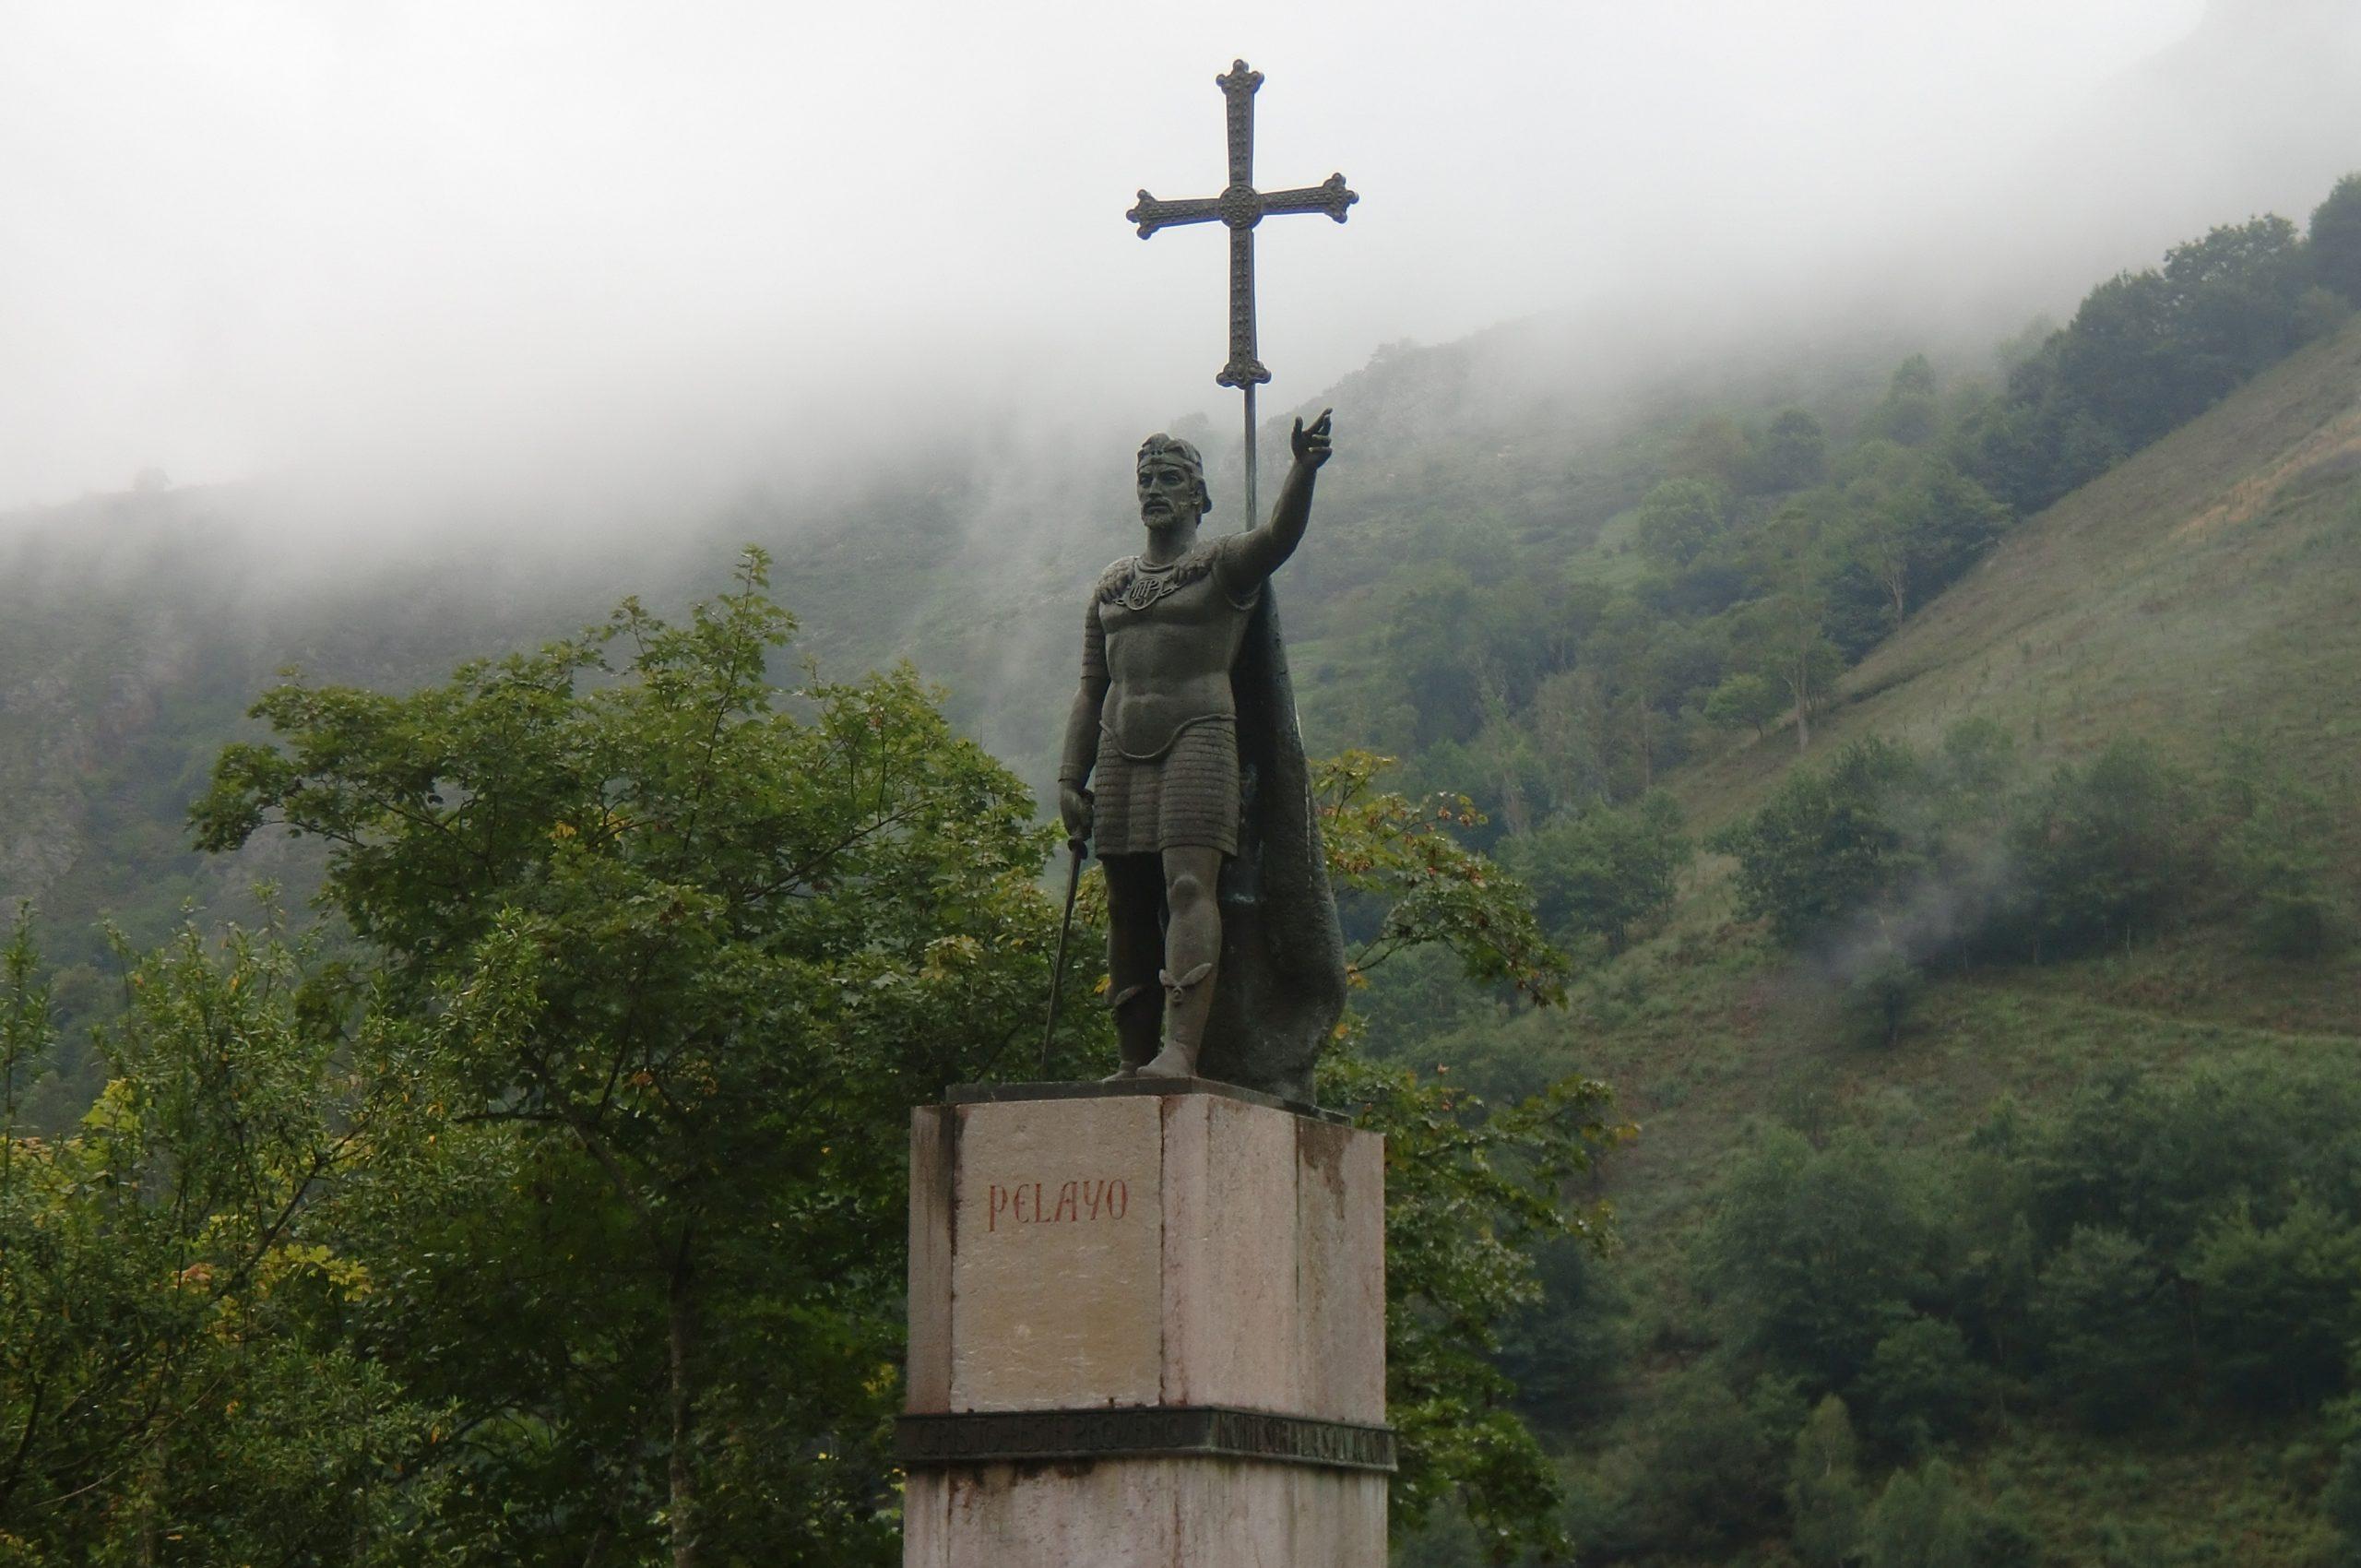 Estatua_de_Don_Pelayo